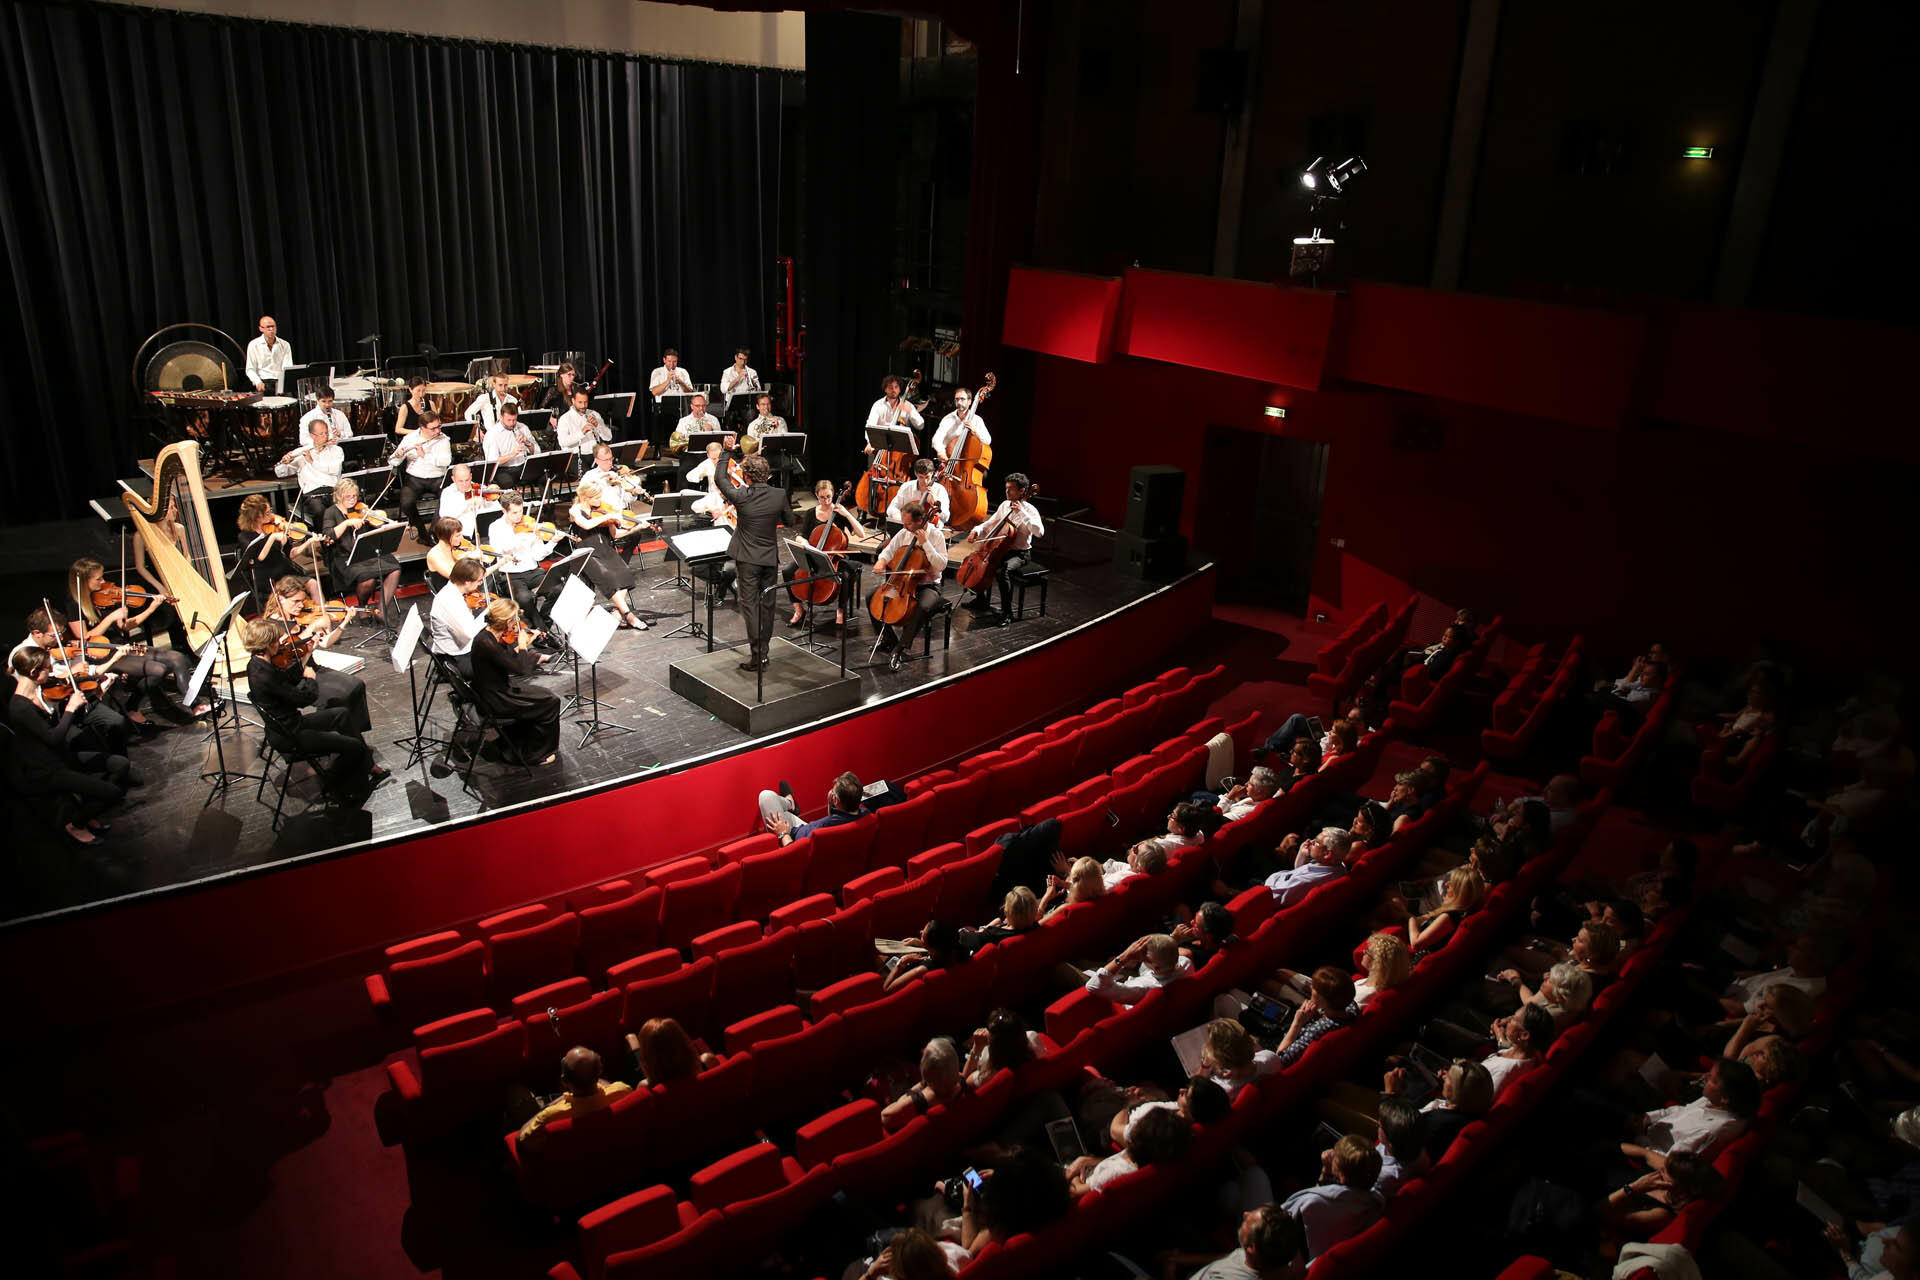 Theatre at Grand Hôtel du Casino in Dieppe, France